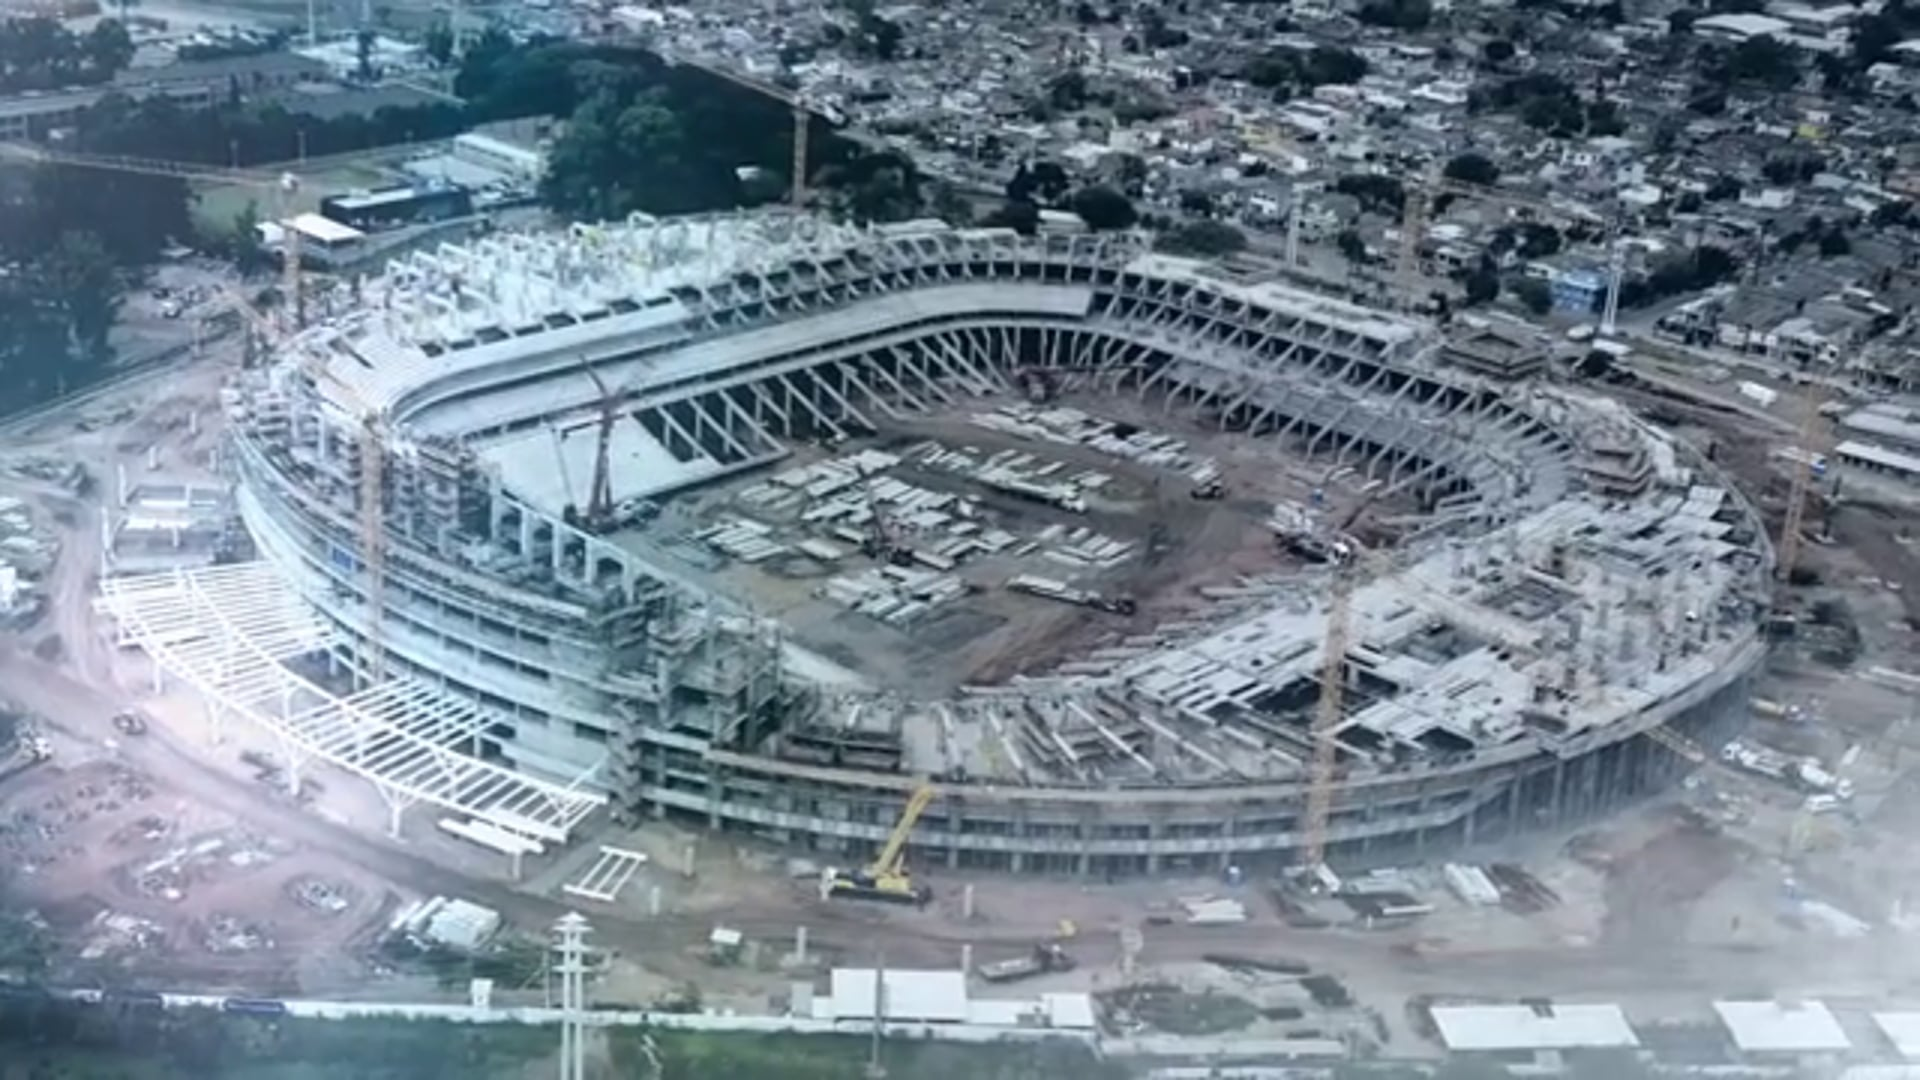 COCA-COLA - Diálogo Entre Dois Estádios